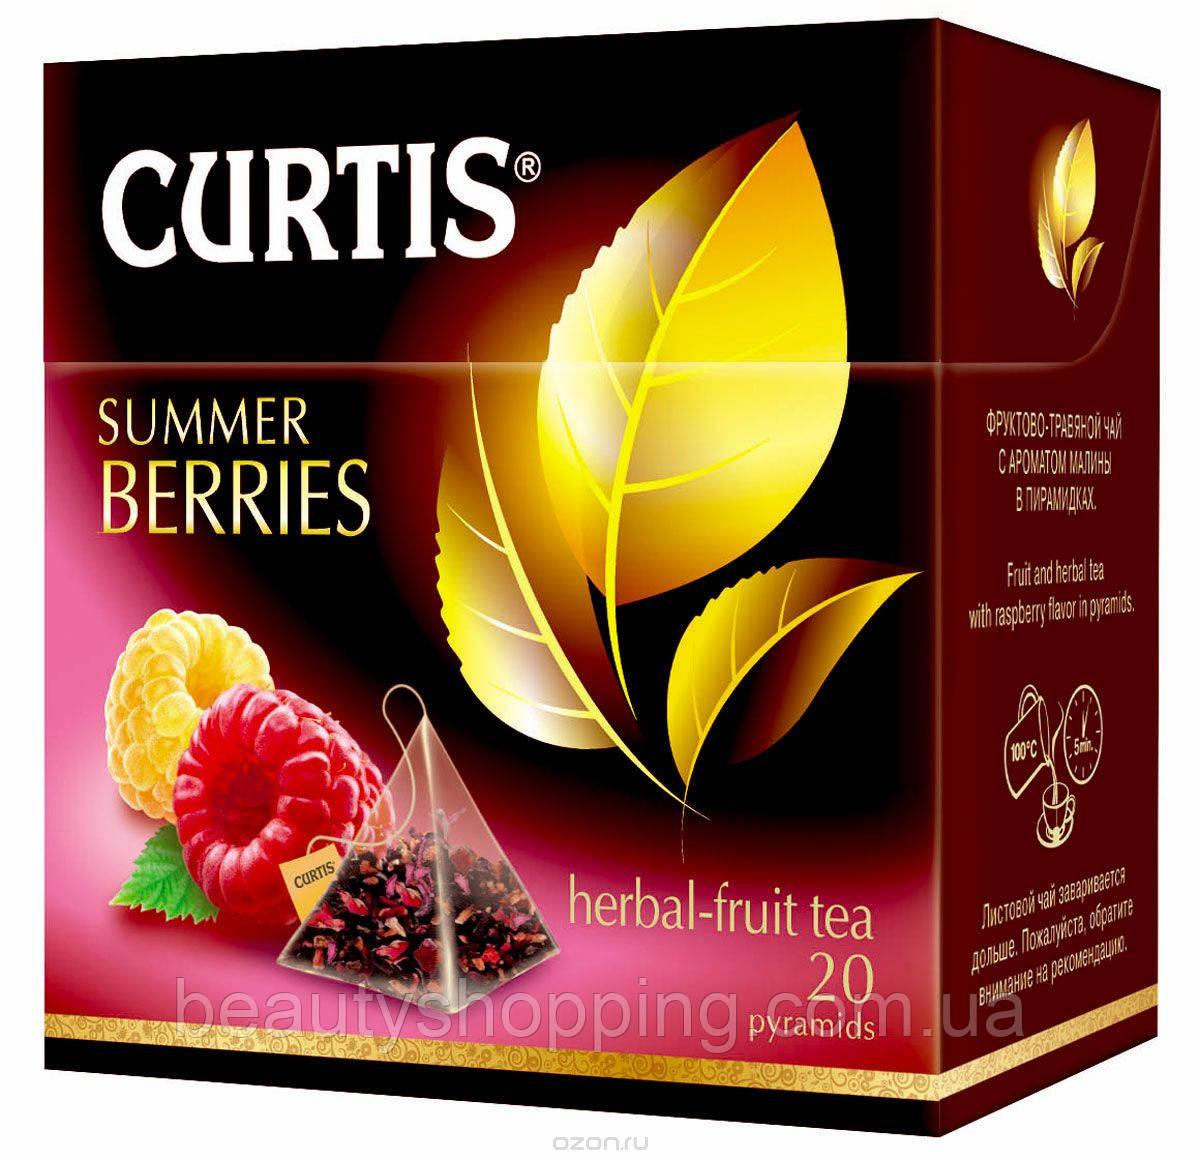 "Чай Curtis ""Summer Berries"" 20 пирамидок."